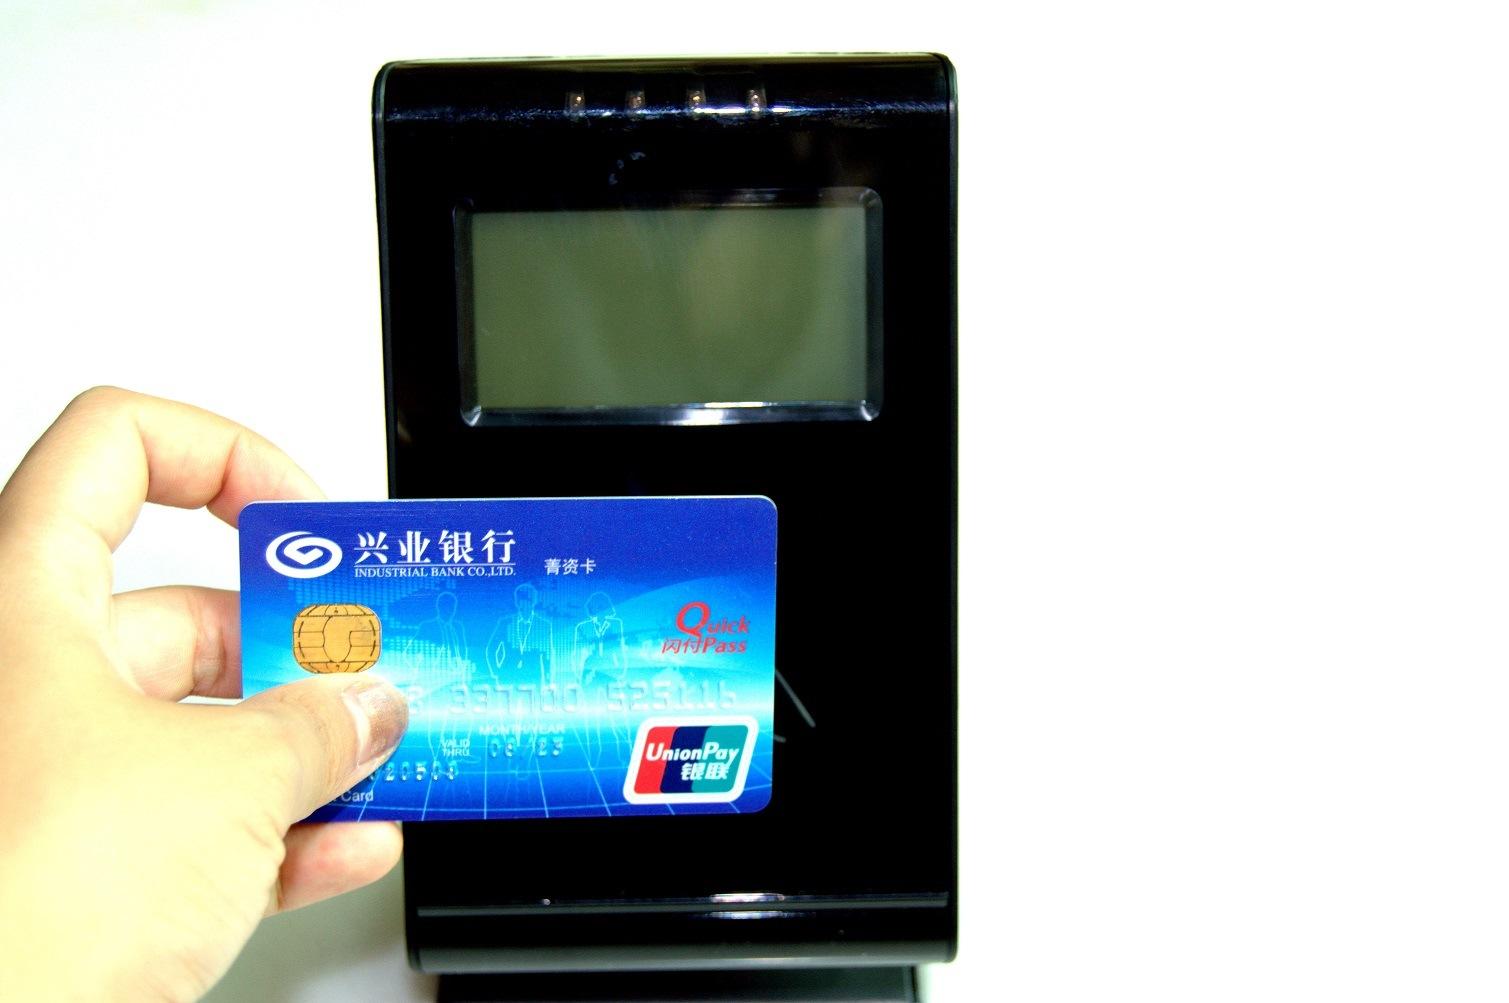 T80 POS Terminal, RFID, MIFARE Card Reader in Reataurant, Supermarket